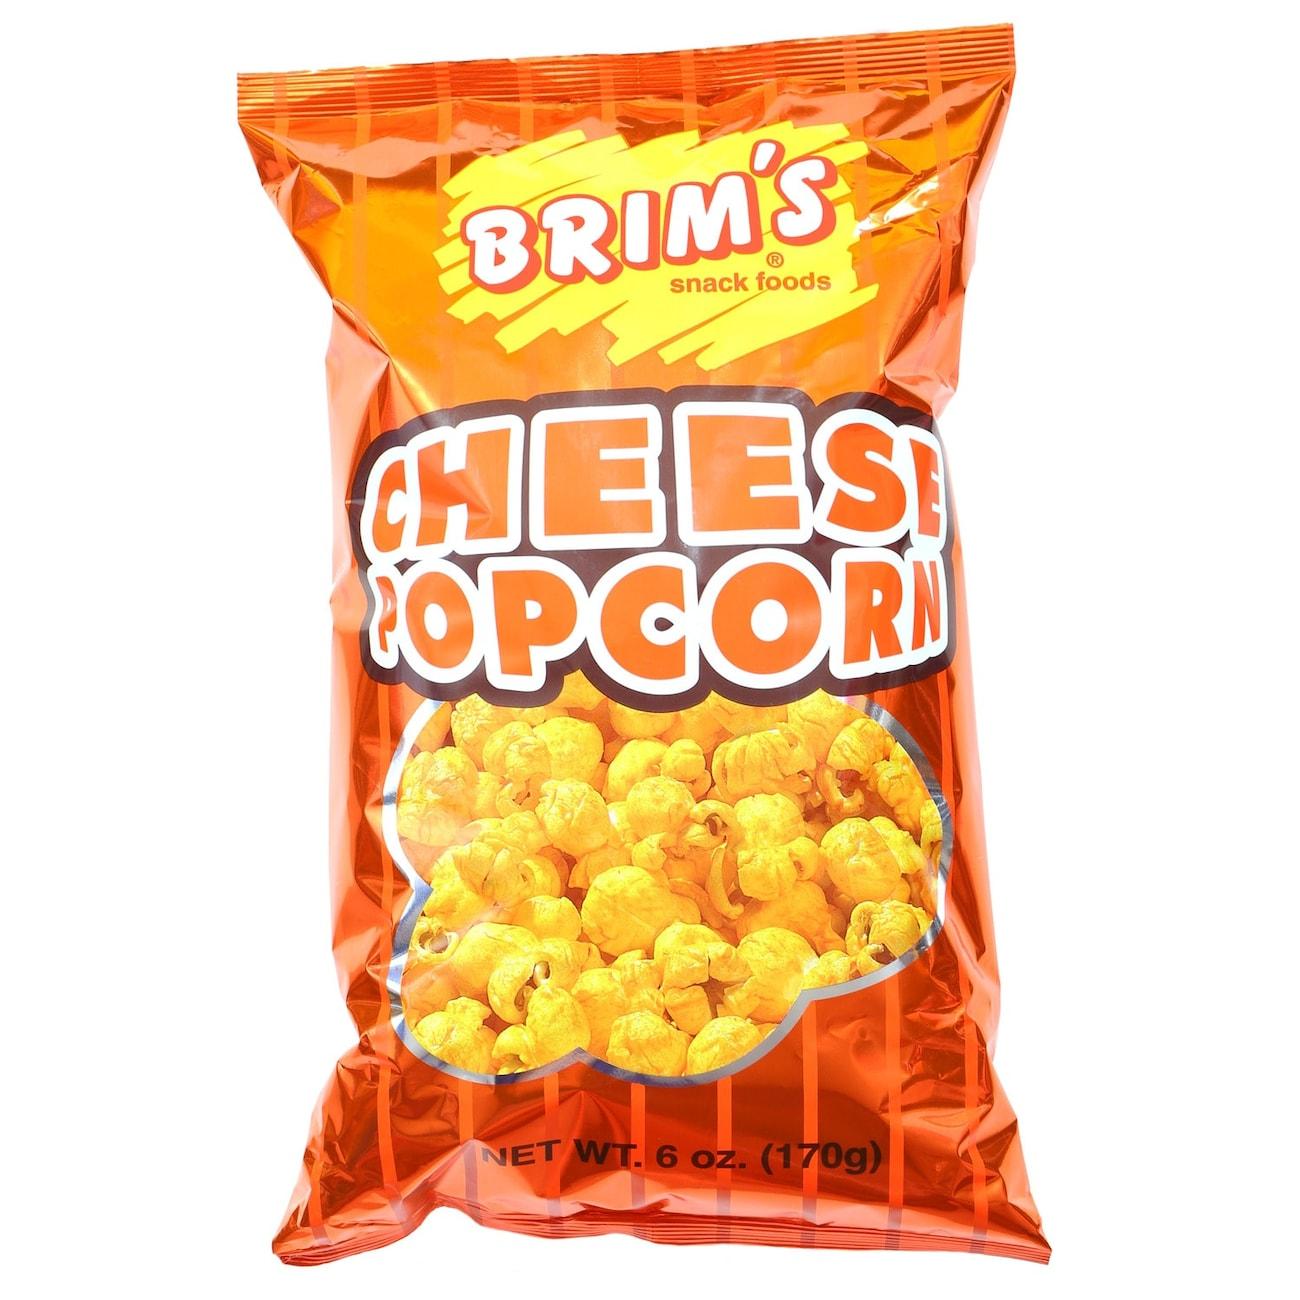 Brims Cheese Popcorn 6 Oz Bags